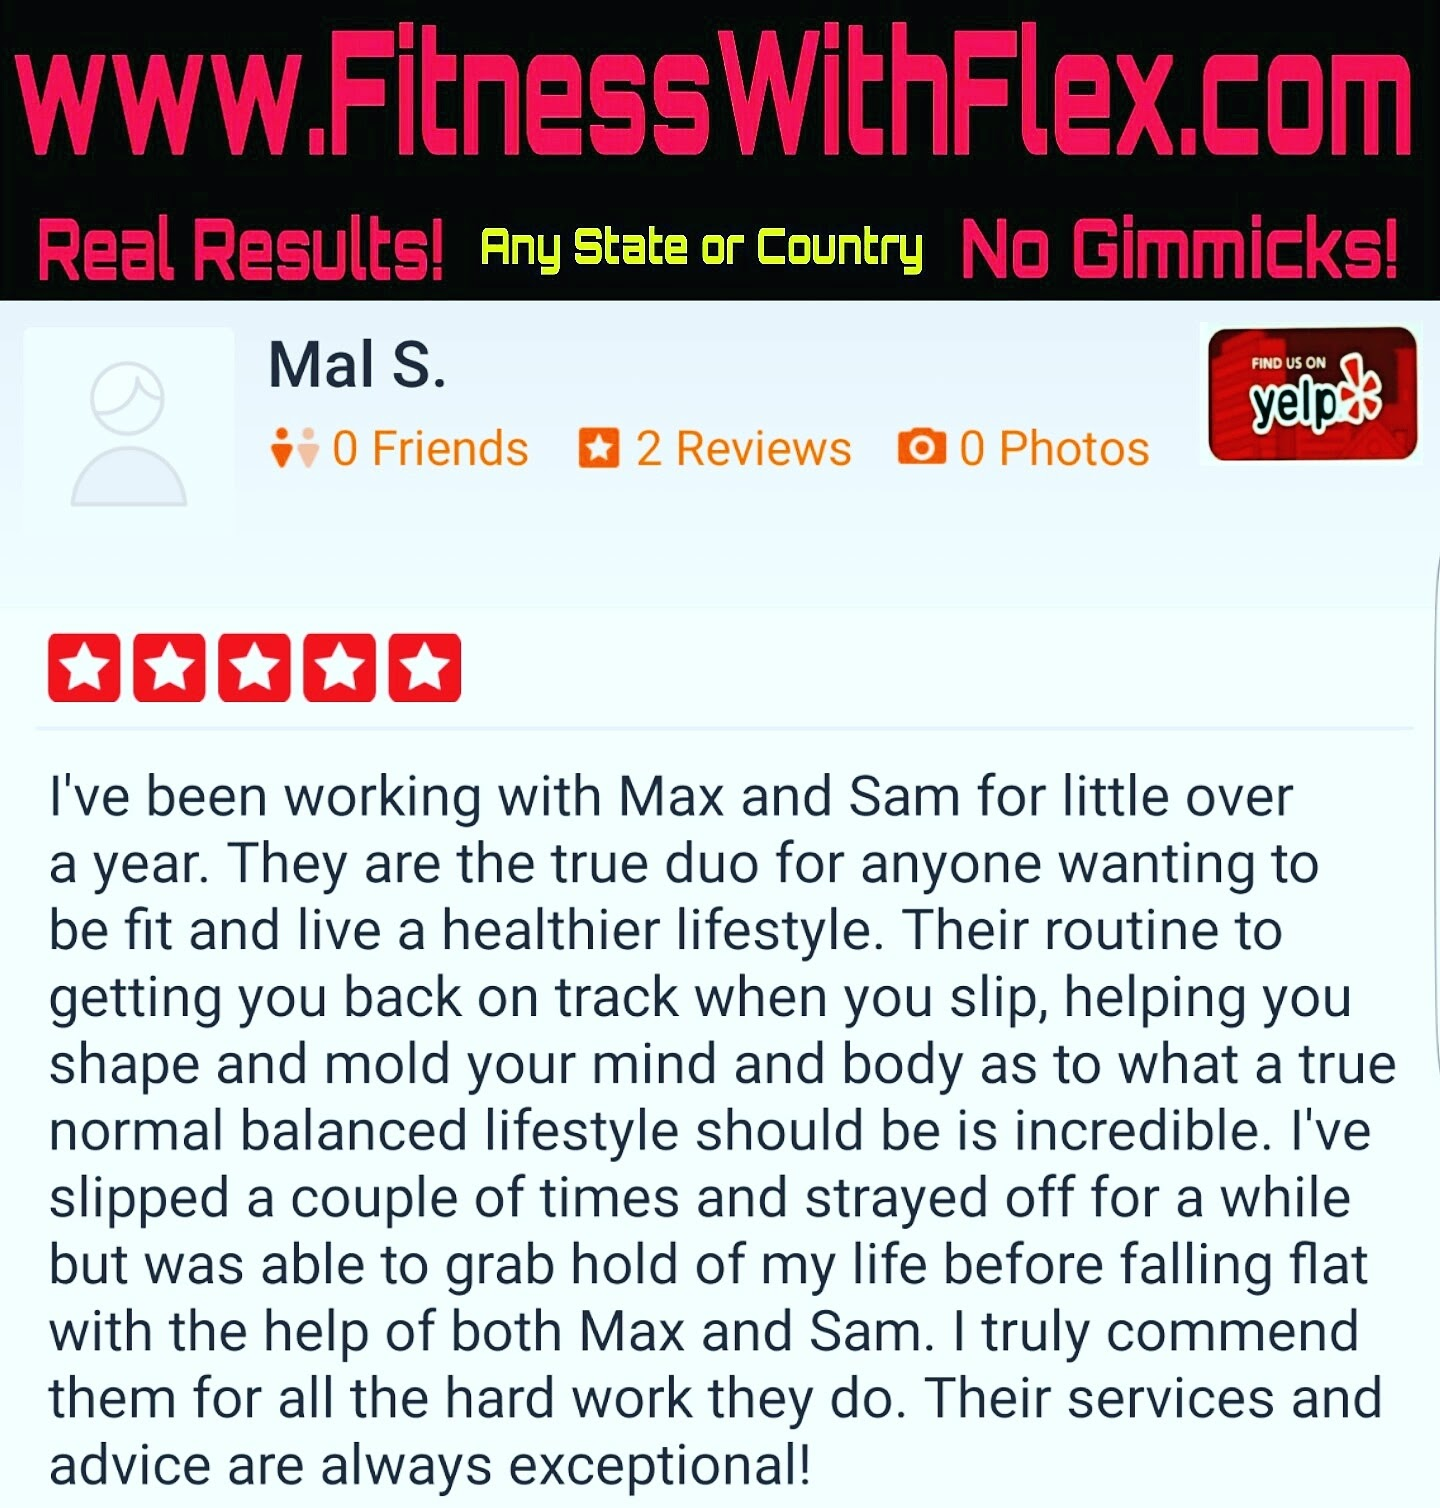 FitnessWithFlex 5 Star Testimonials